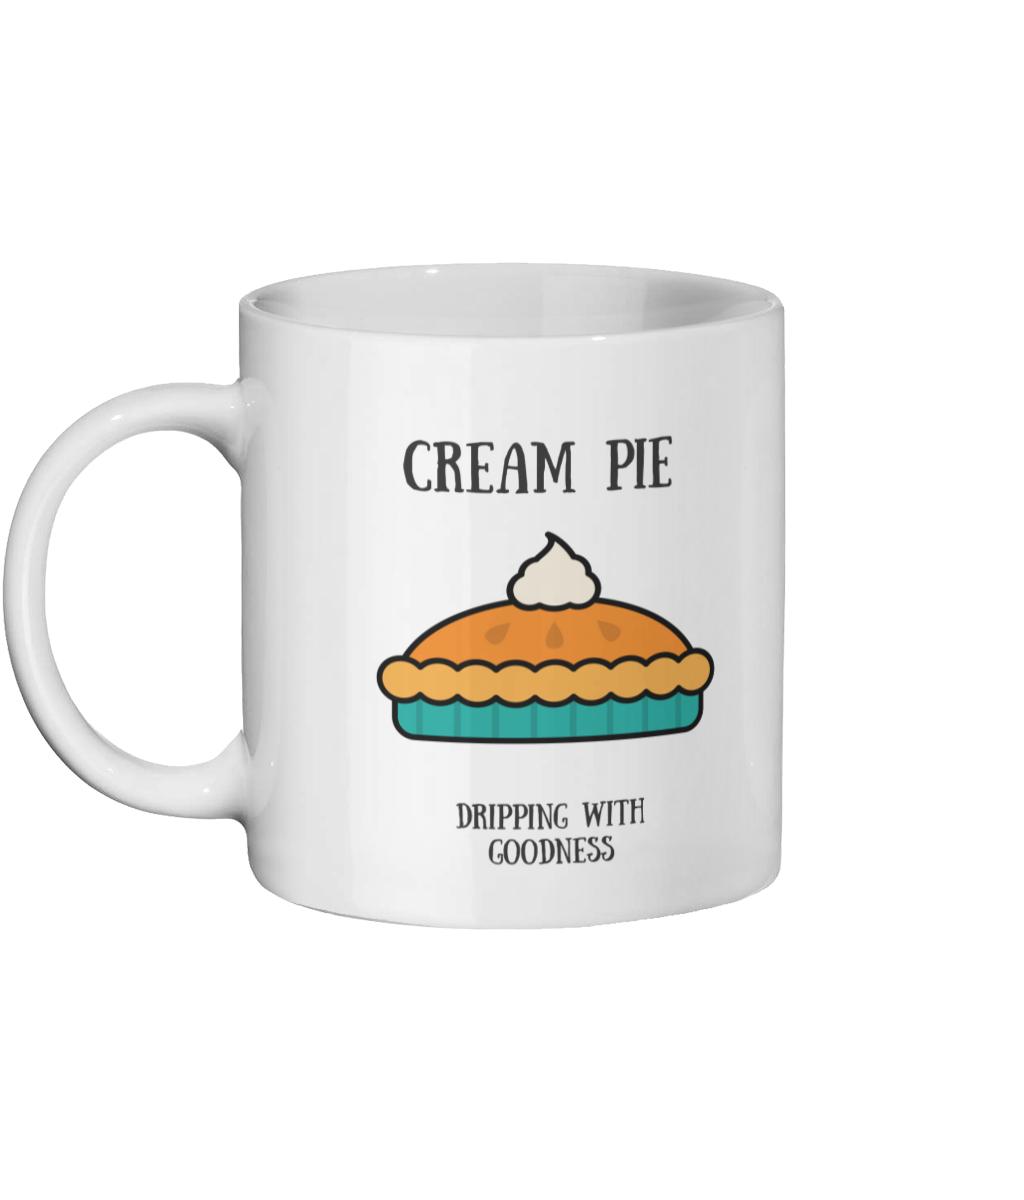 Cream Pie Mug Left side